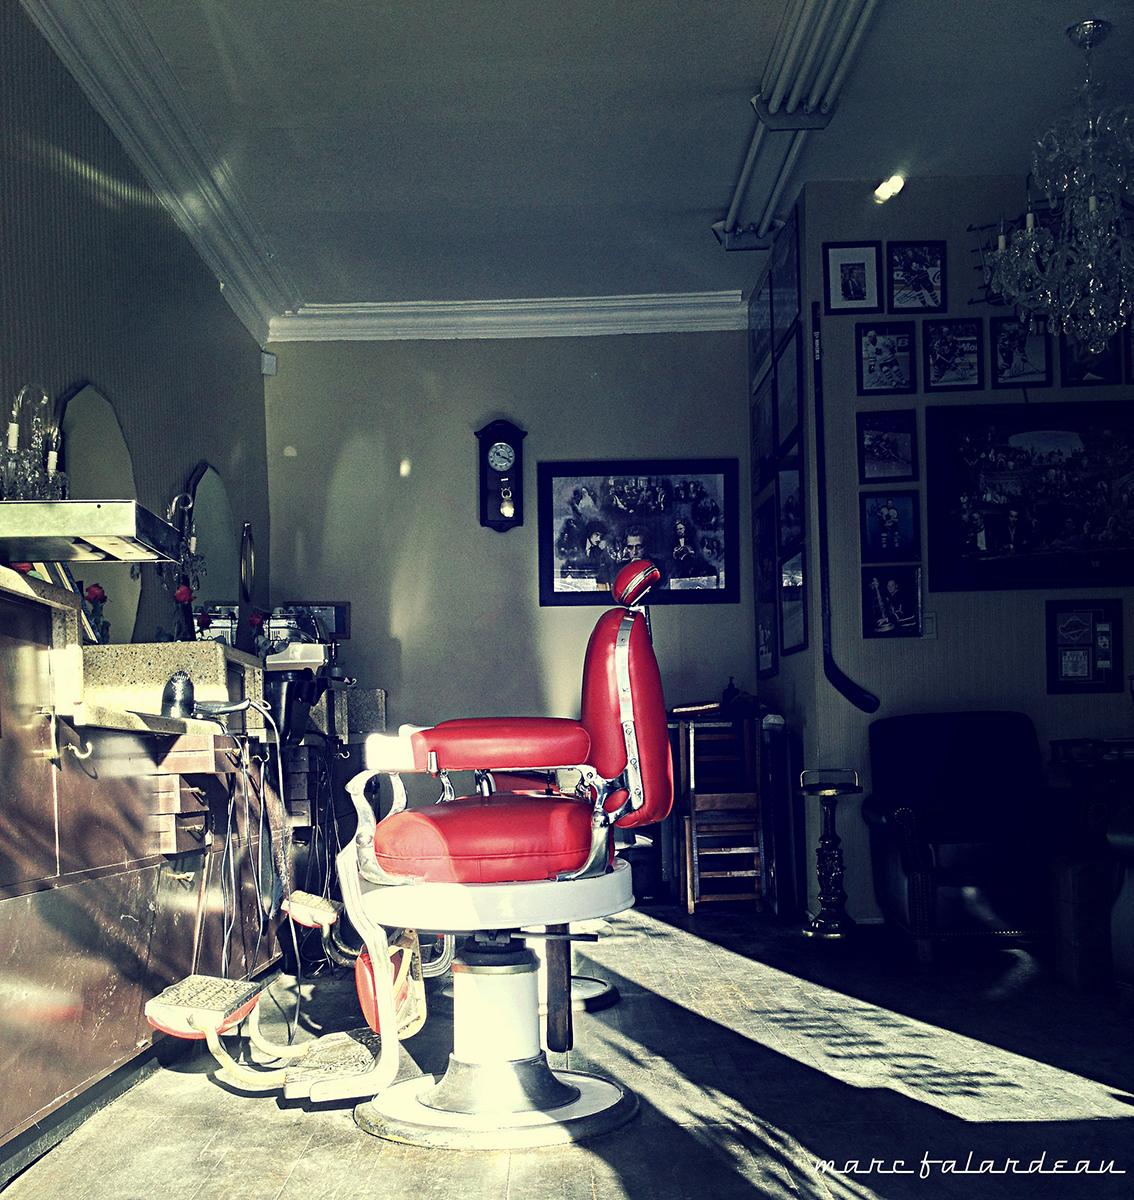 Salon de coiffure hbc coiffure - Salon de coiffure africain montpellier ...